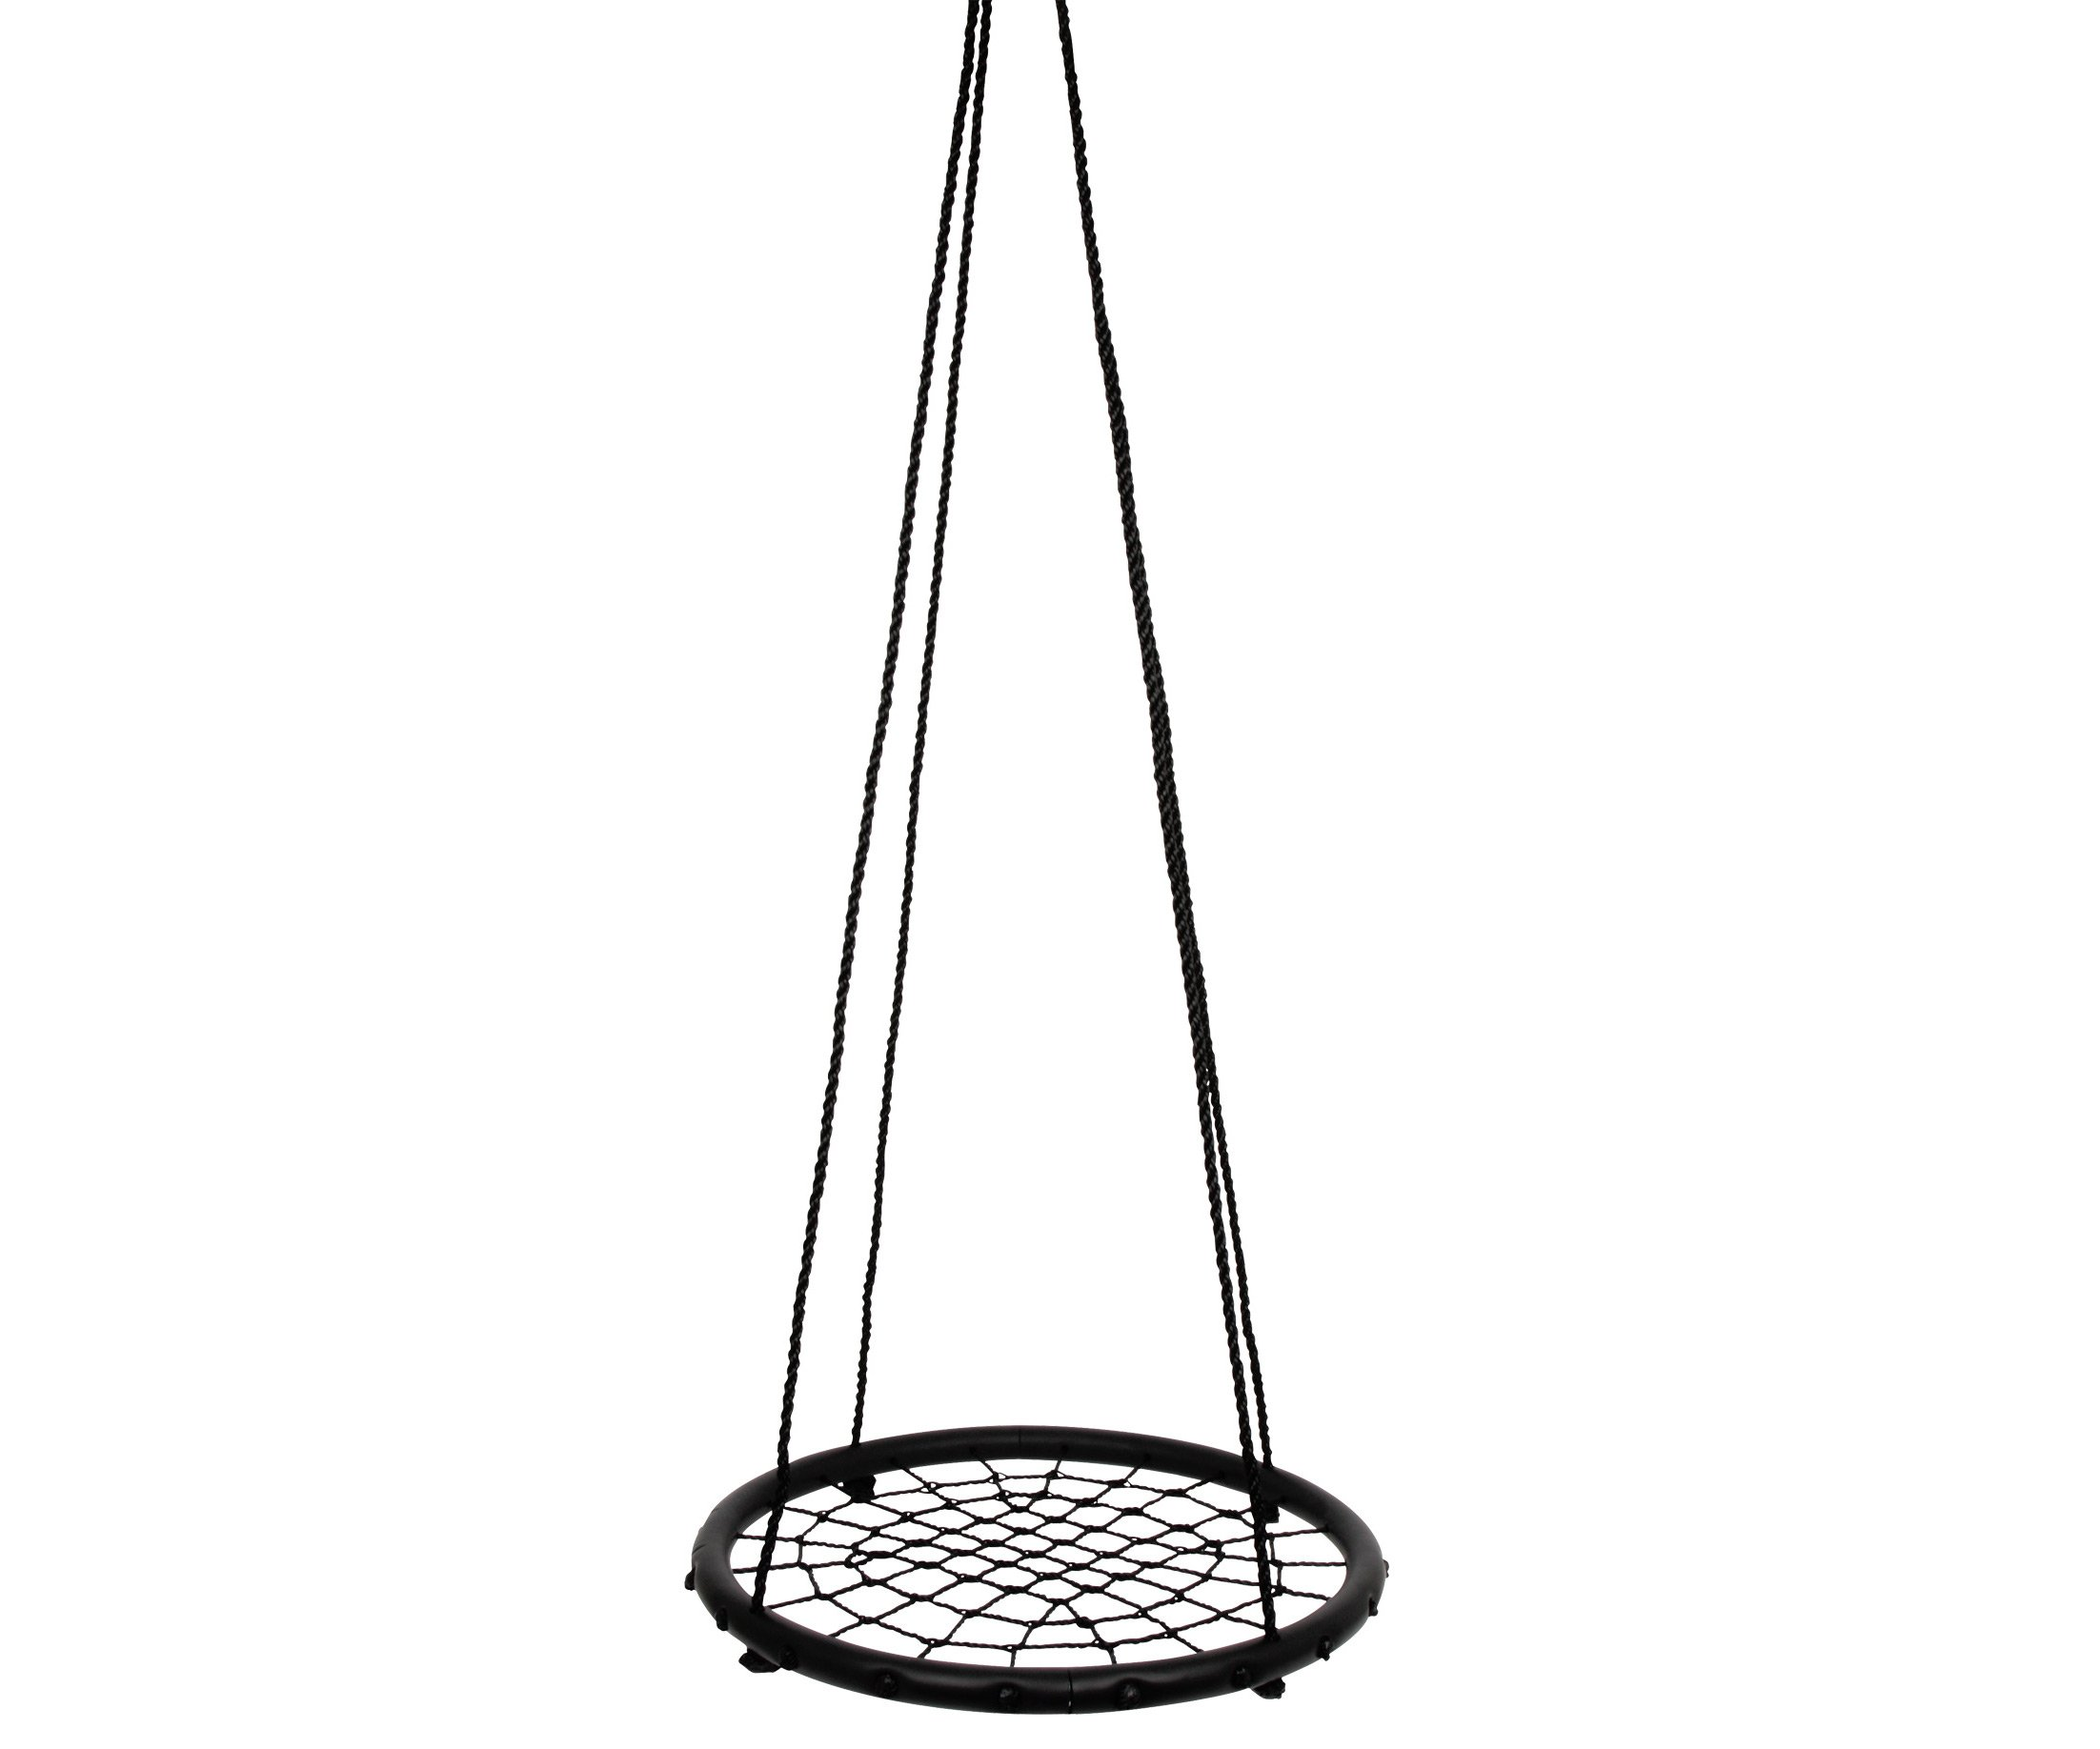 Houpačka dětská čapí hnízdo síť 61cm Small foot